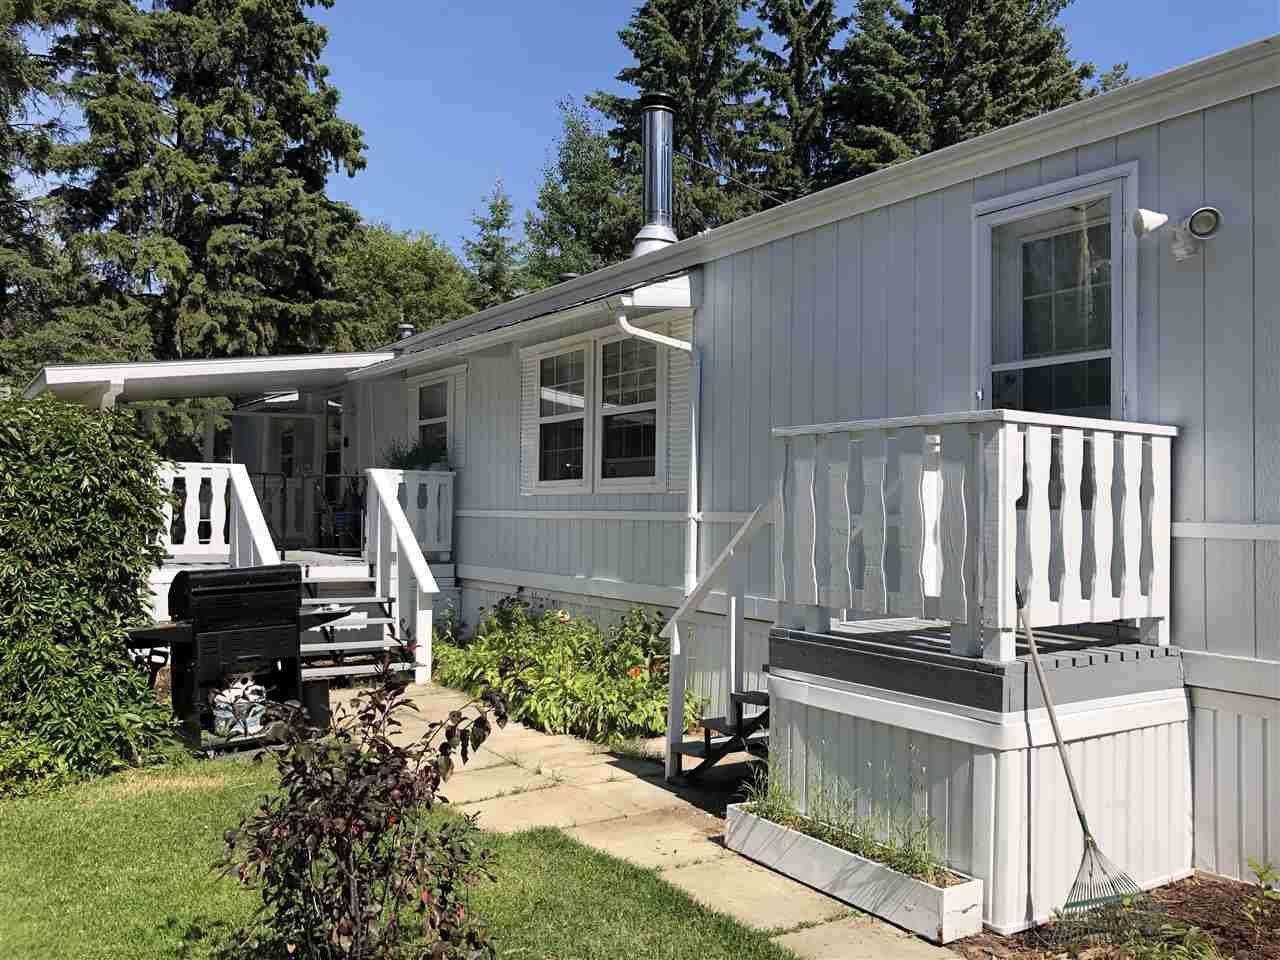 Main Photo: 408 3 Street: Winfield House for sale : MLS®# E4211176